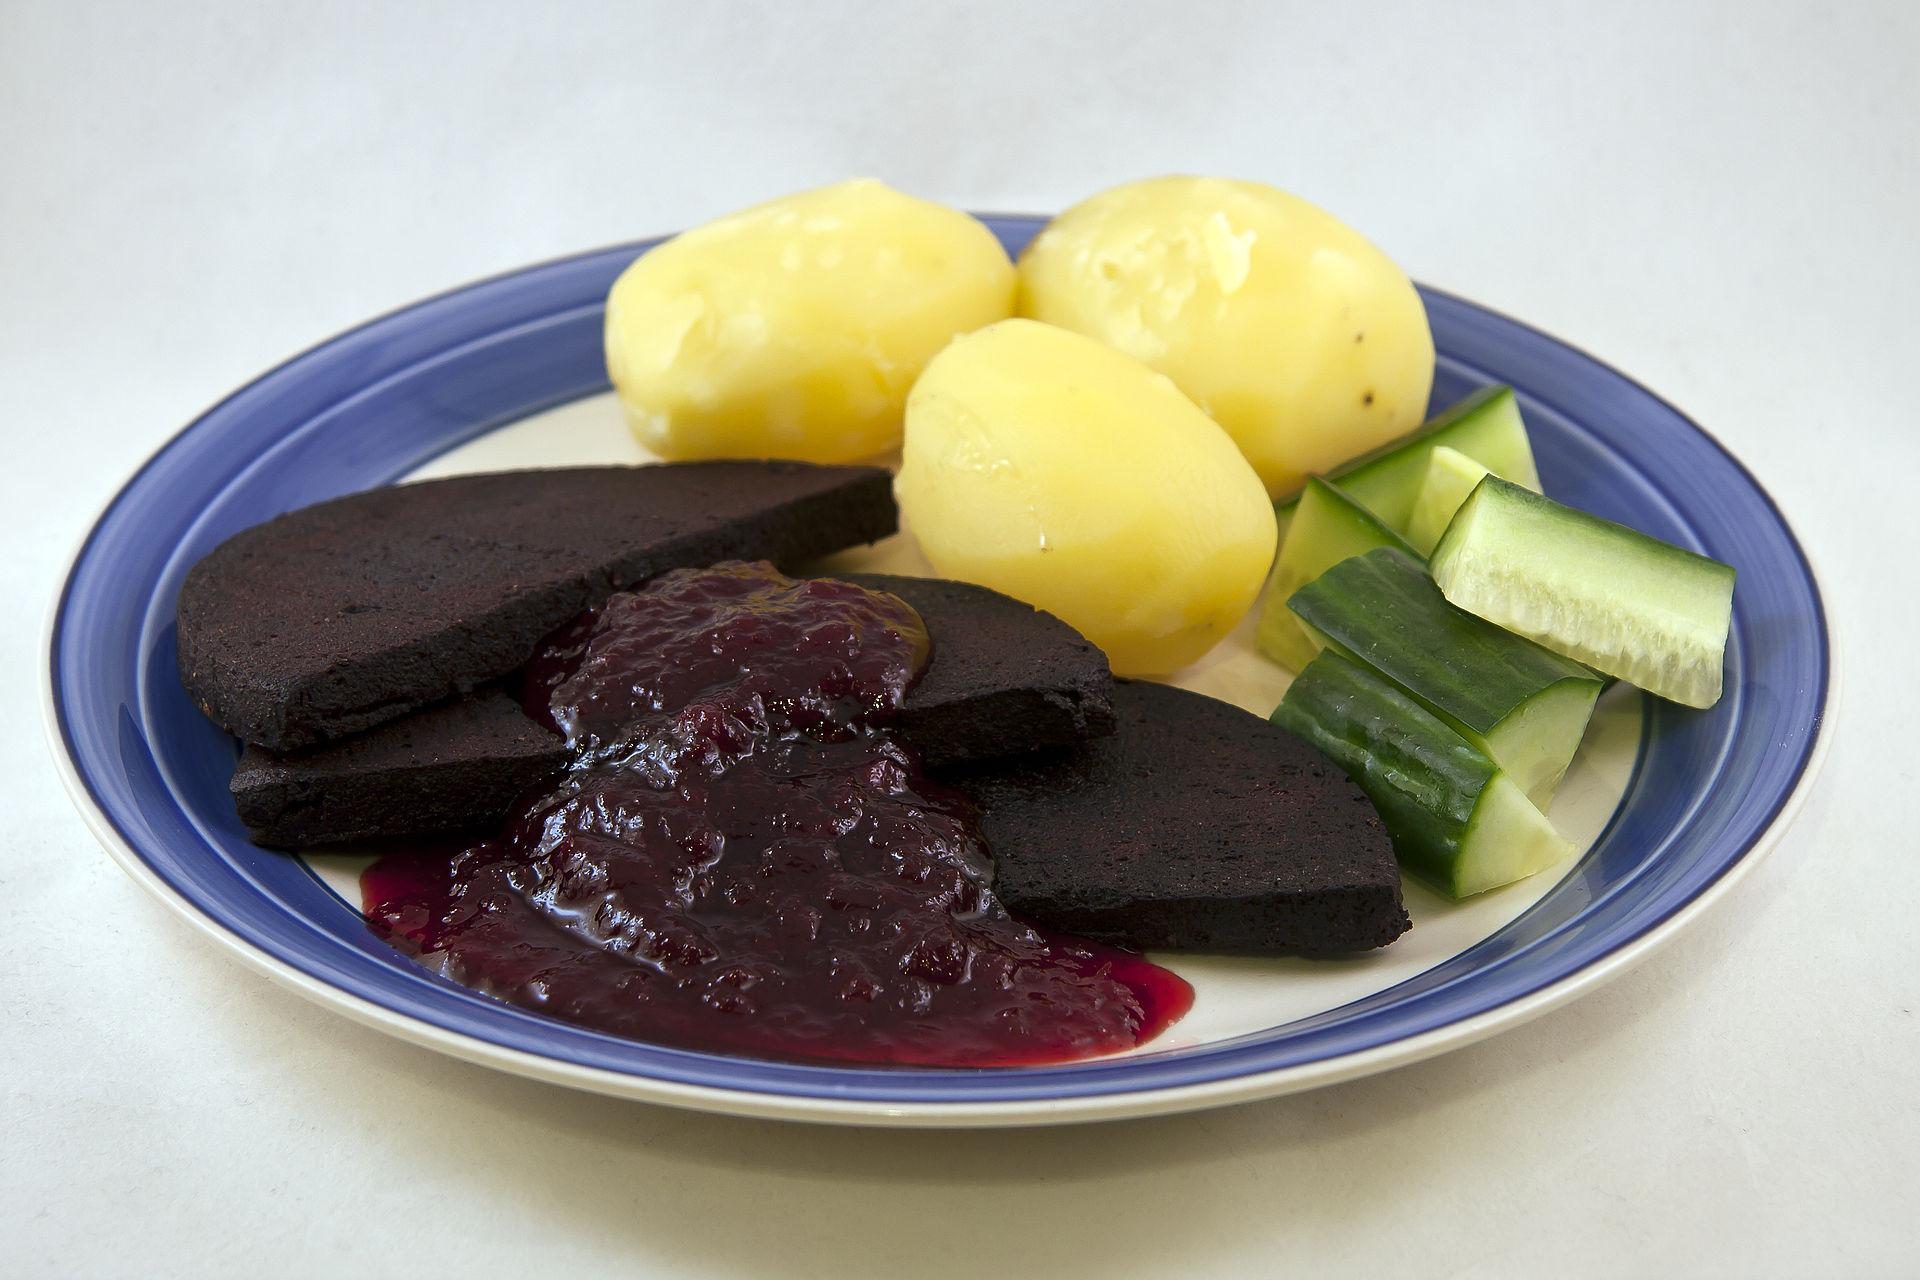 Lingonberry jam - Wikipedia